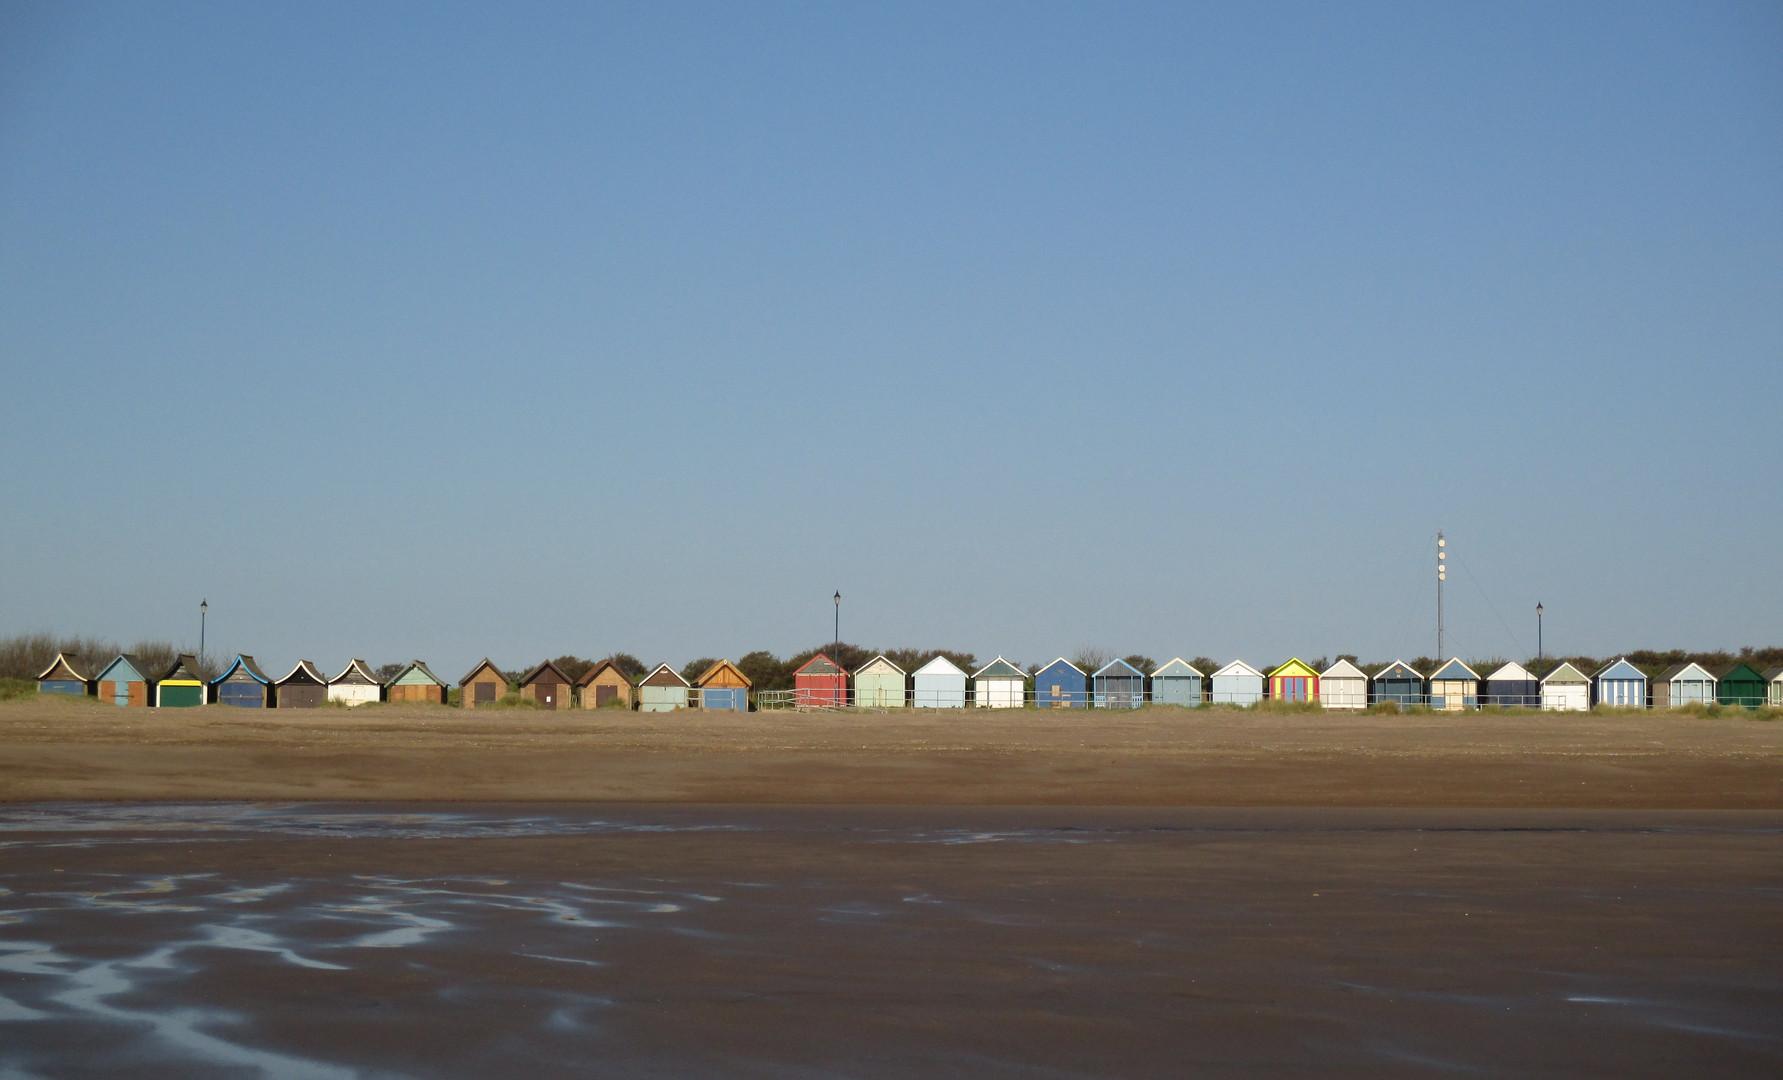 Beach huts at Sutton on Sea